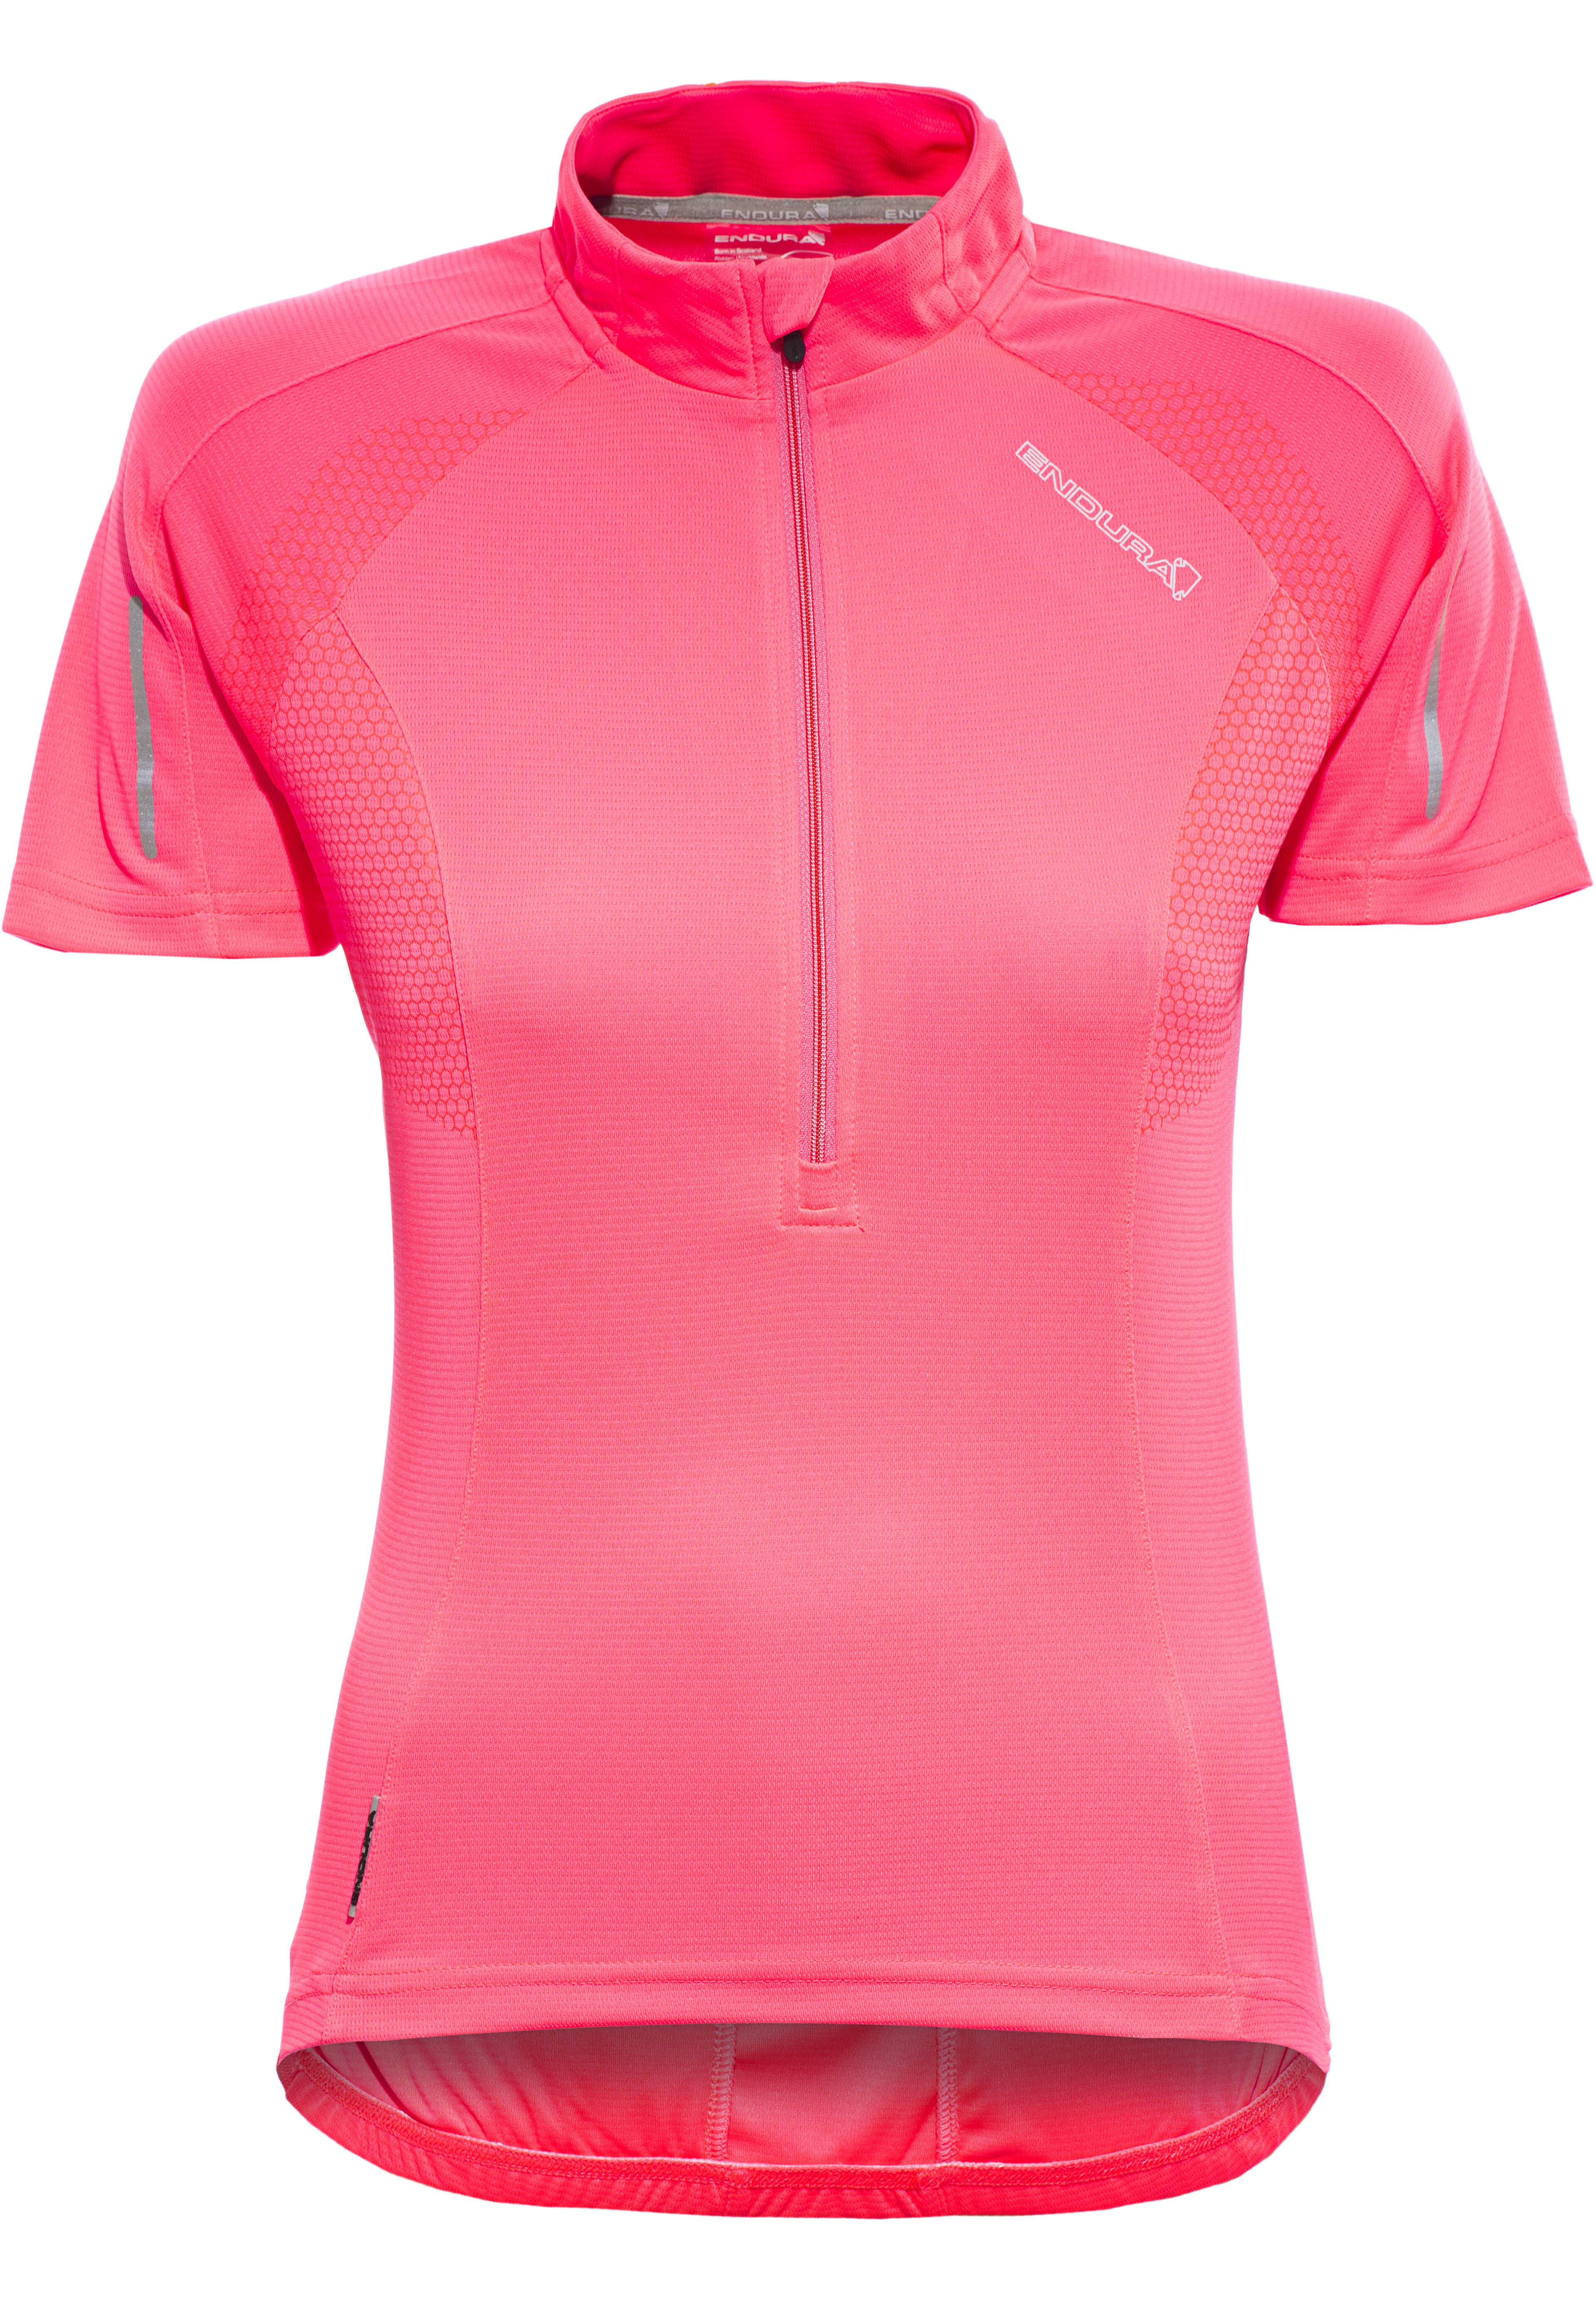 c6415008e Endura Xtract Bike Jersey Shortsleeve Women pink at Bikester.co.uk